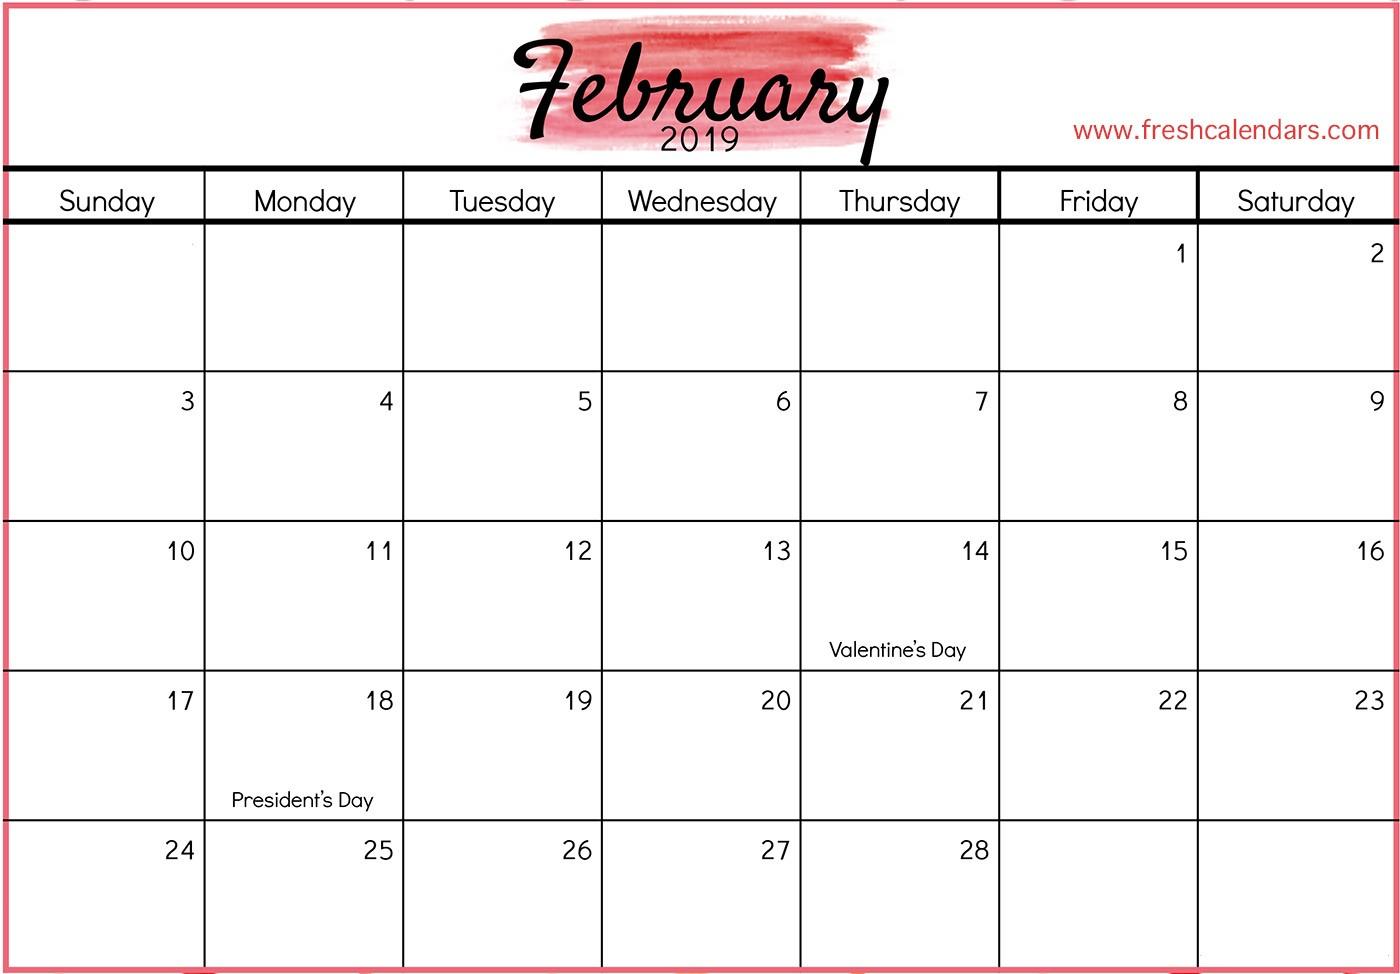 Blank February 2019 Calendar Printable Templates